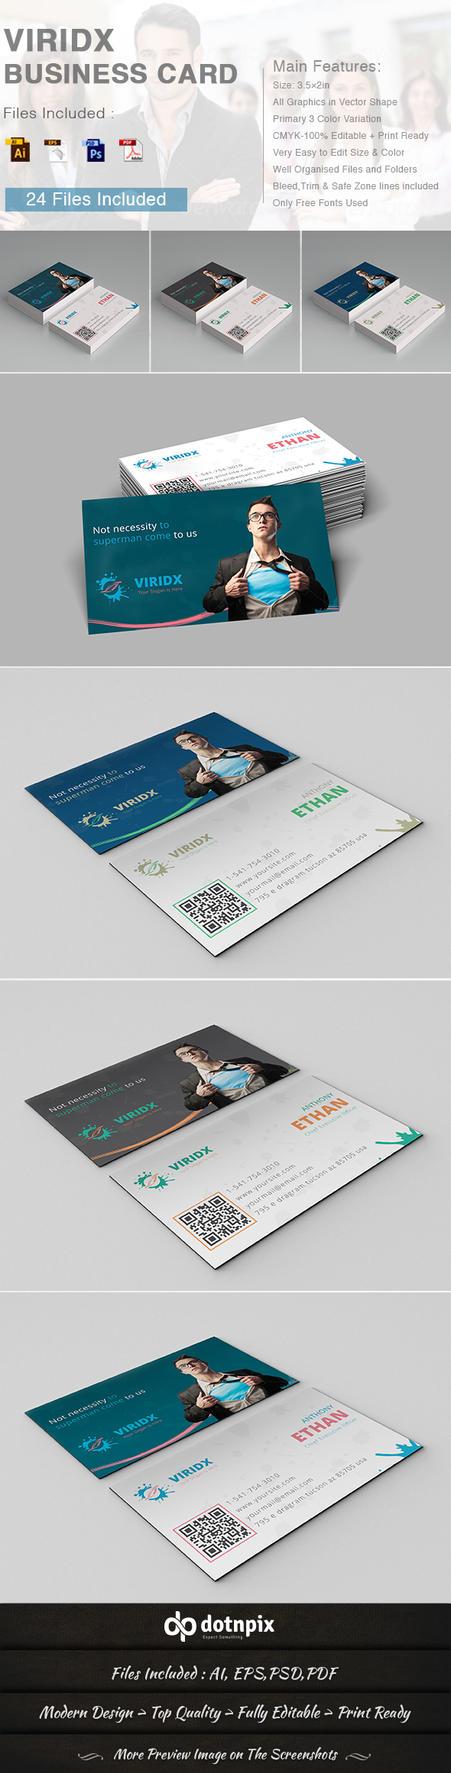 Viridx Business Card by dotnpix